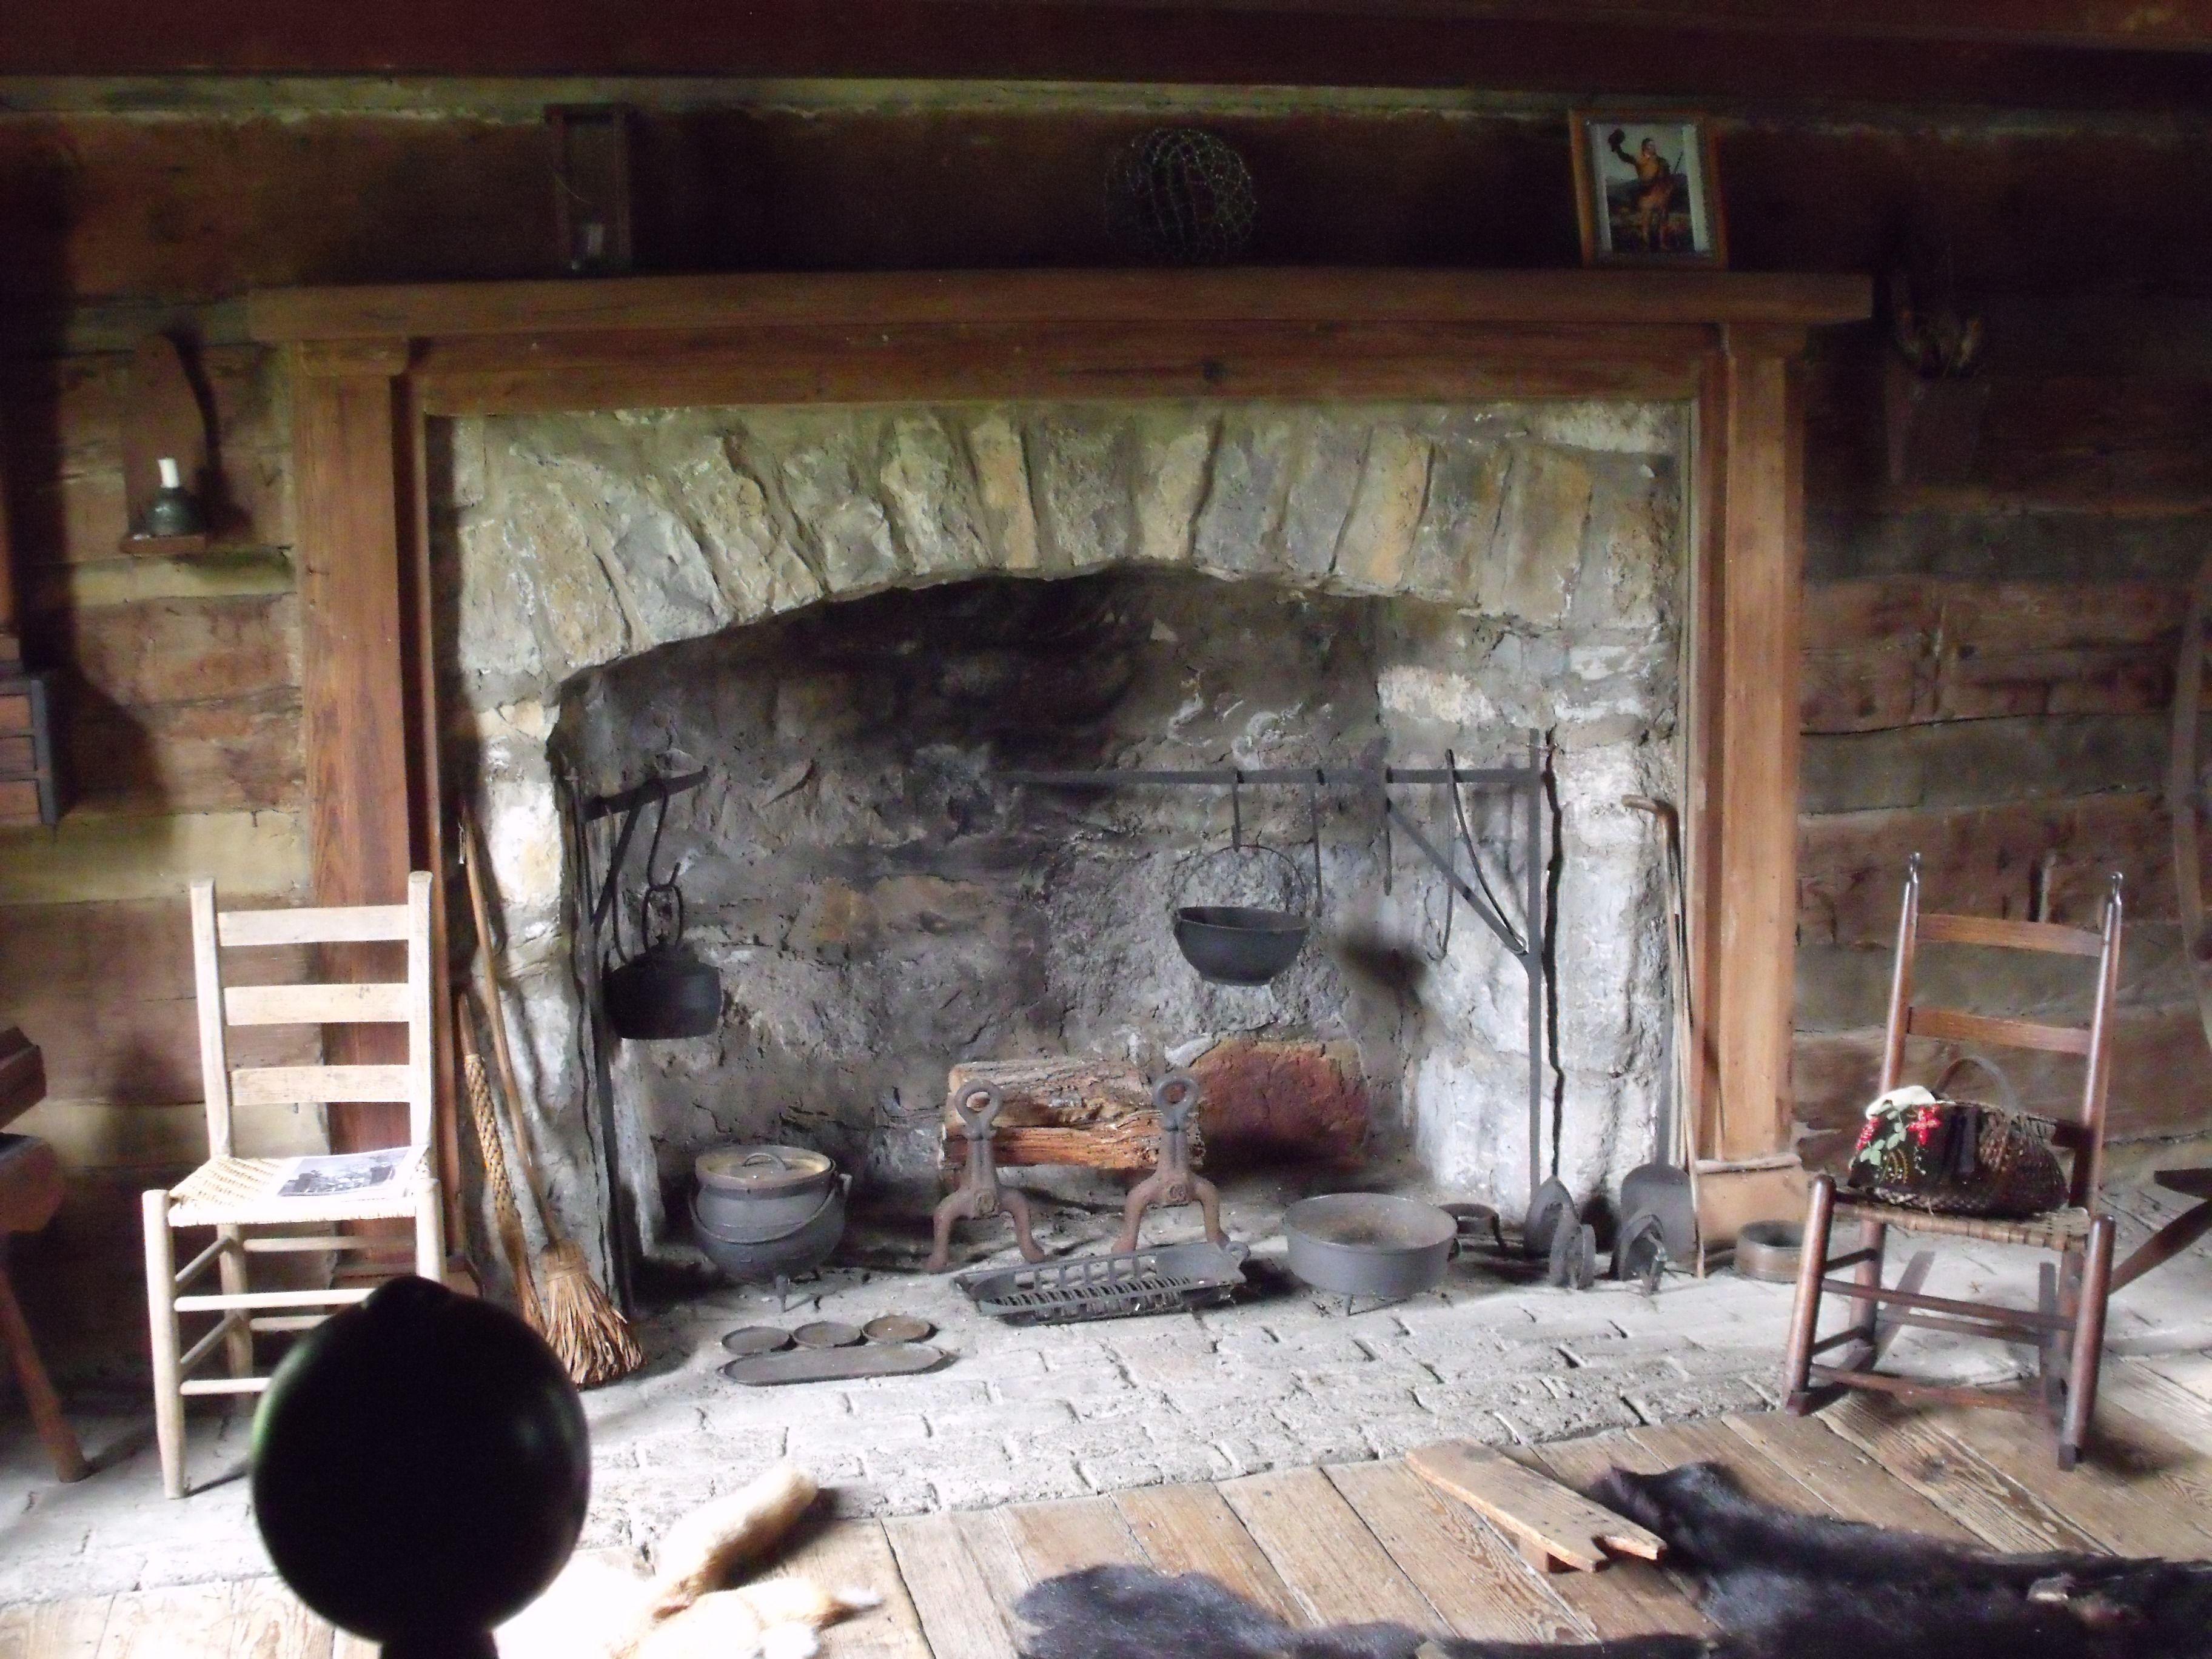 View Of U0027trueu0027 Tavern Room. Bearskin Rug, Hearth Cooking Equipment,